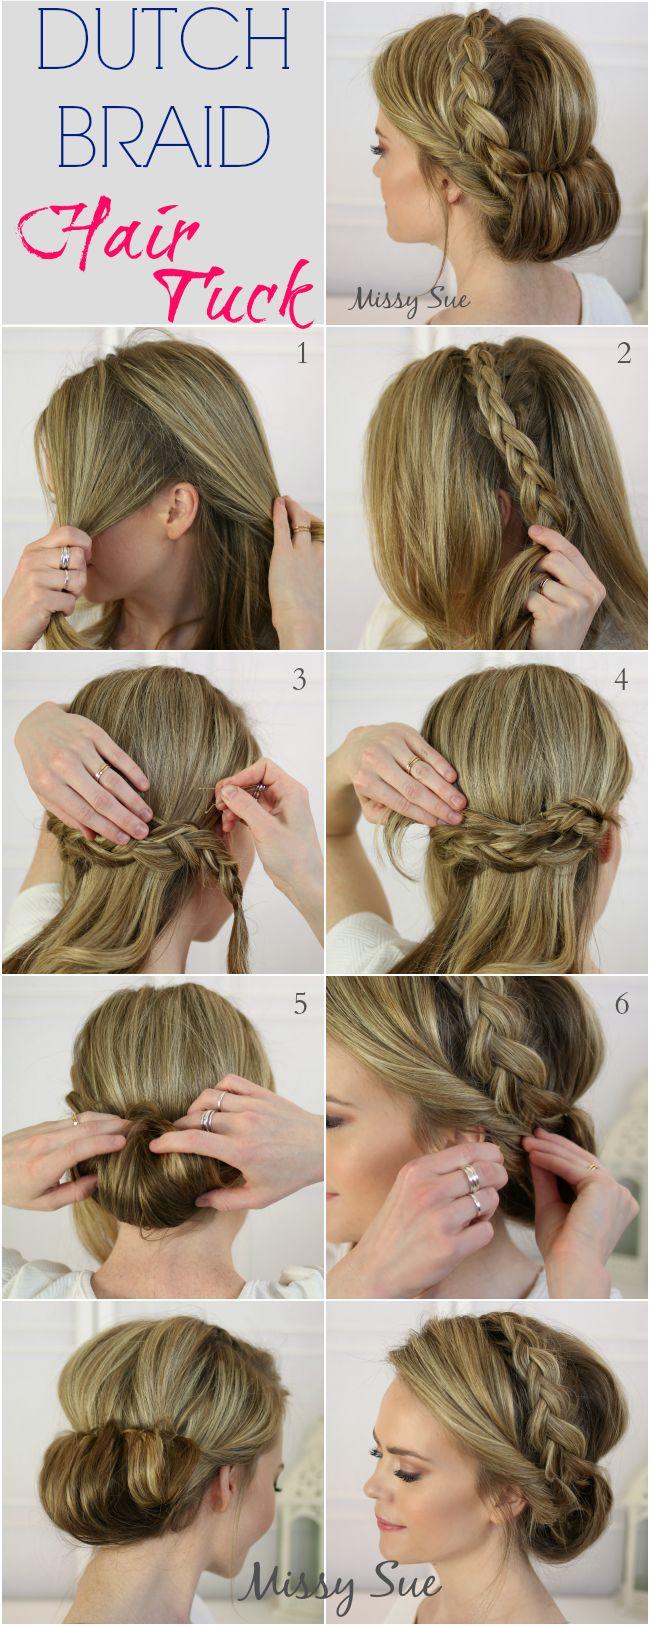 Outstanding 1000 Ideas About Braided Headband Hairstyles On Pinterest Short Hairstyles Gunalazisus